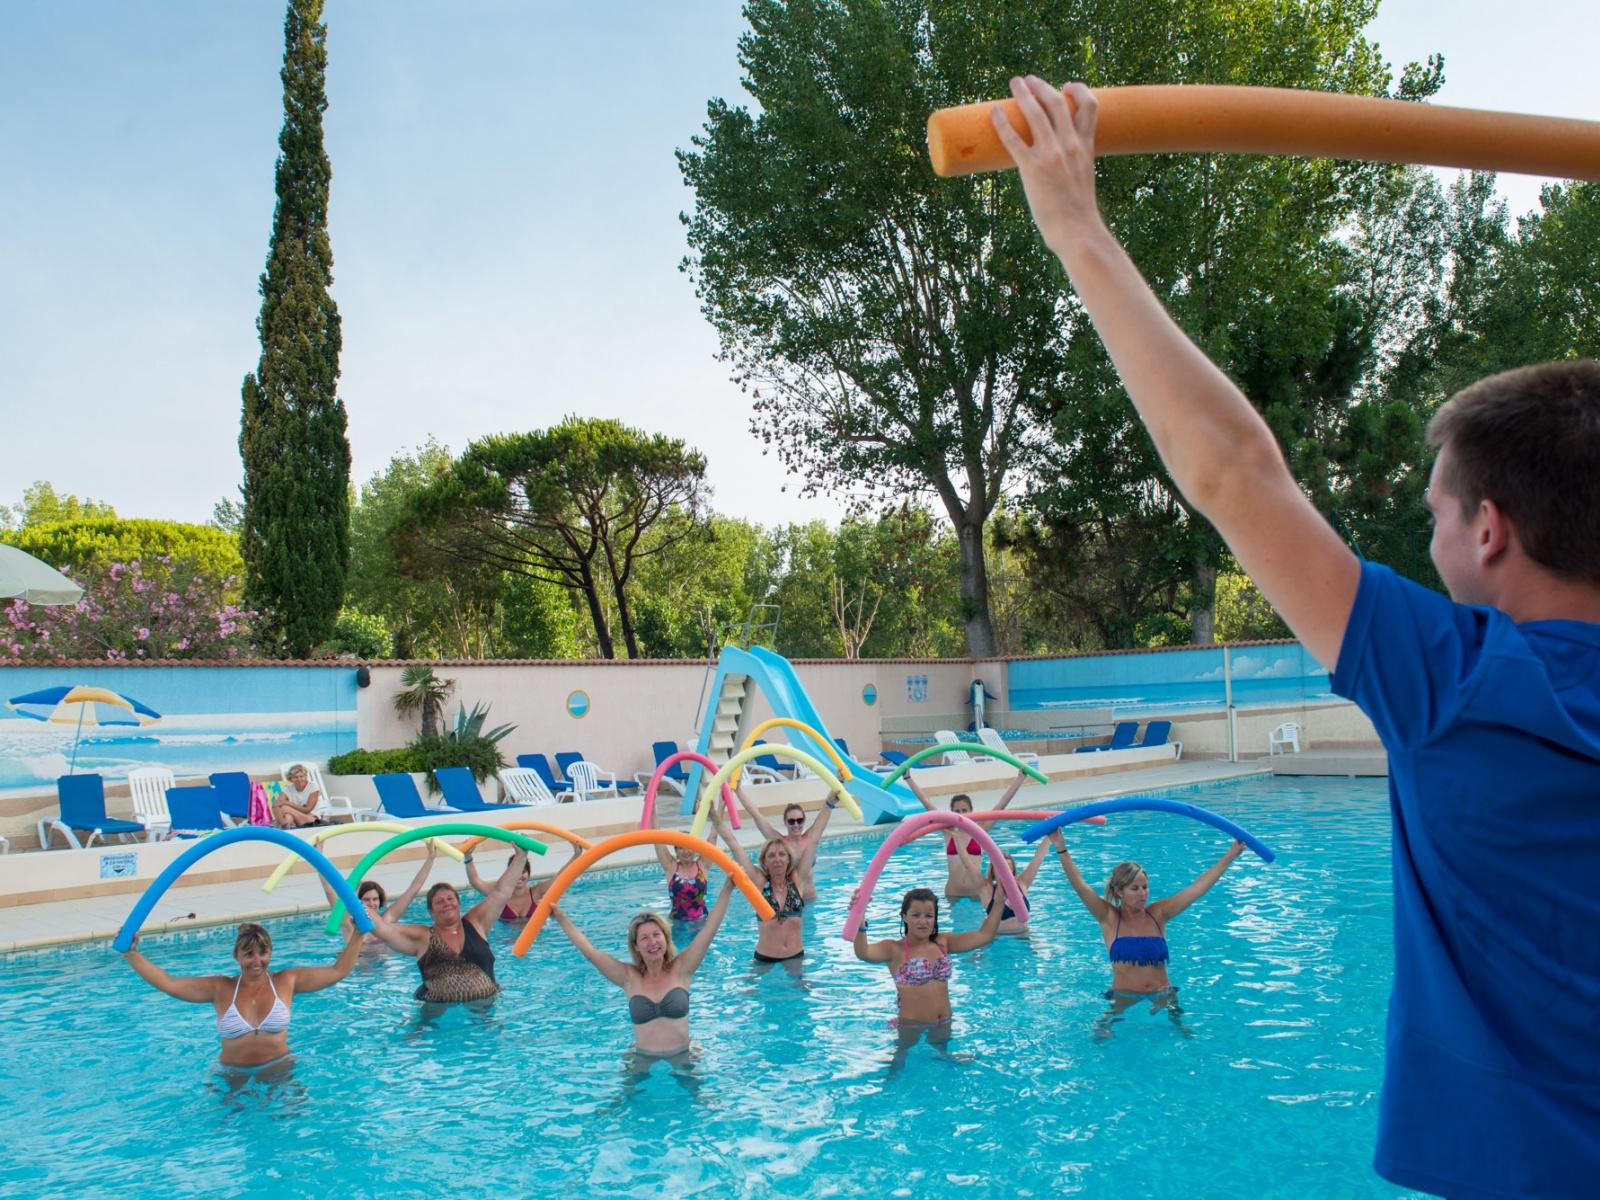 Camping familial camargue vos vacances pleines d 39 animations for Camping en camargue avec piscine